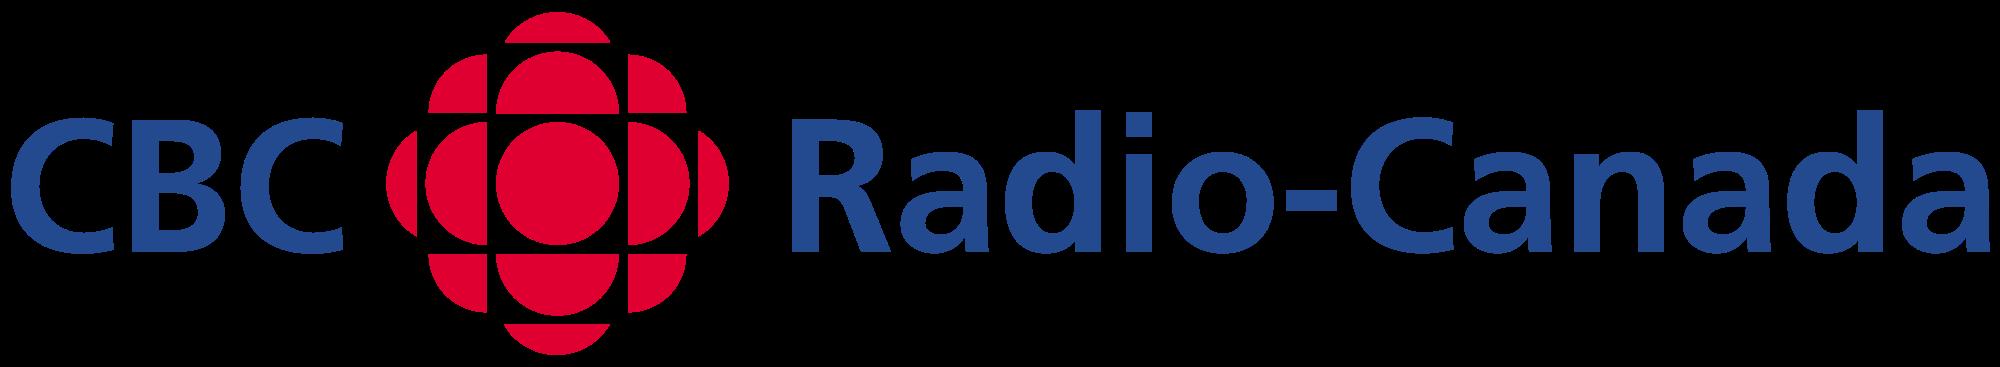 CBC-RadioCanada